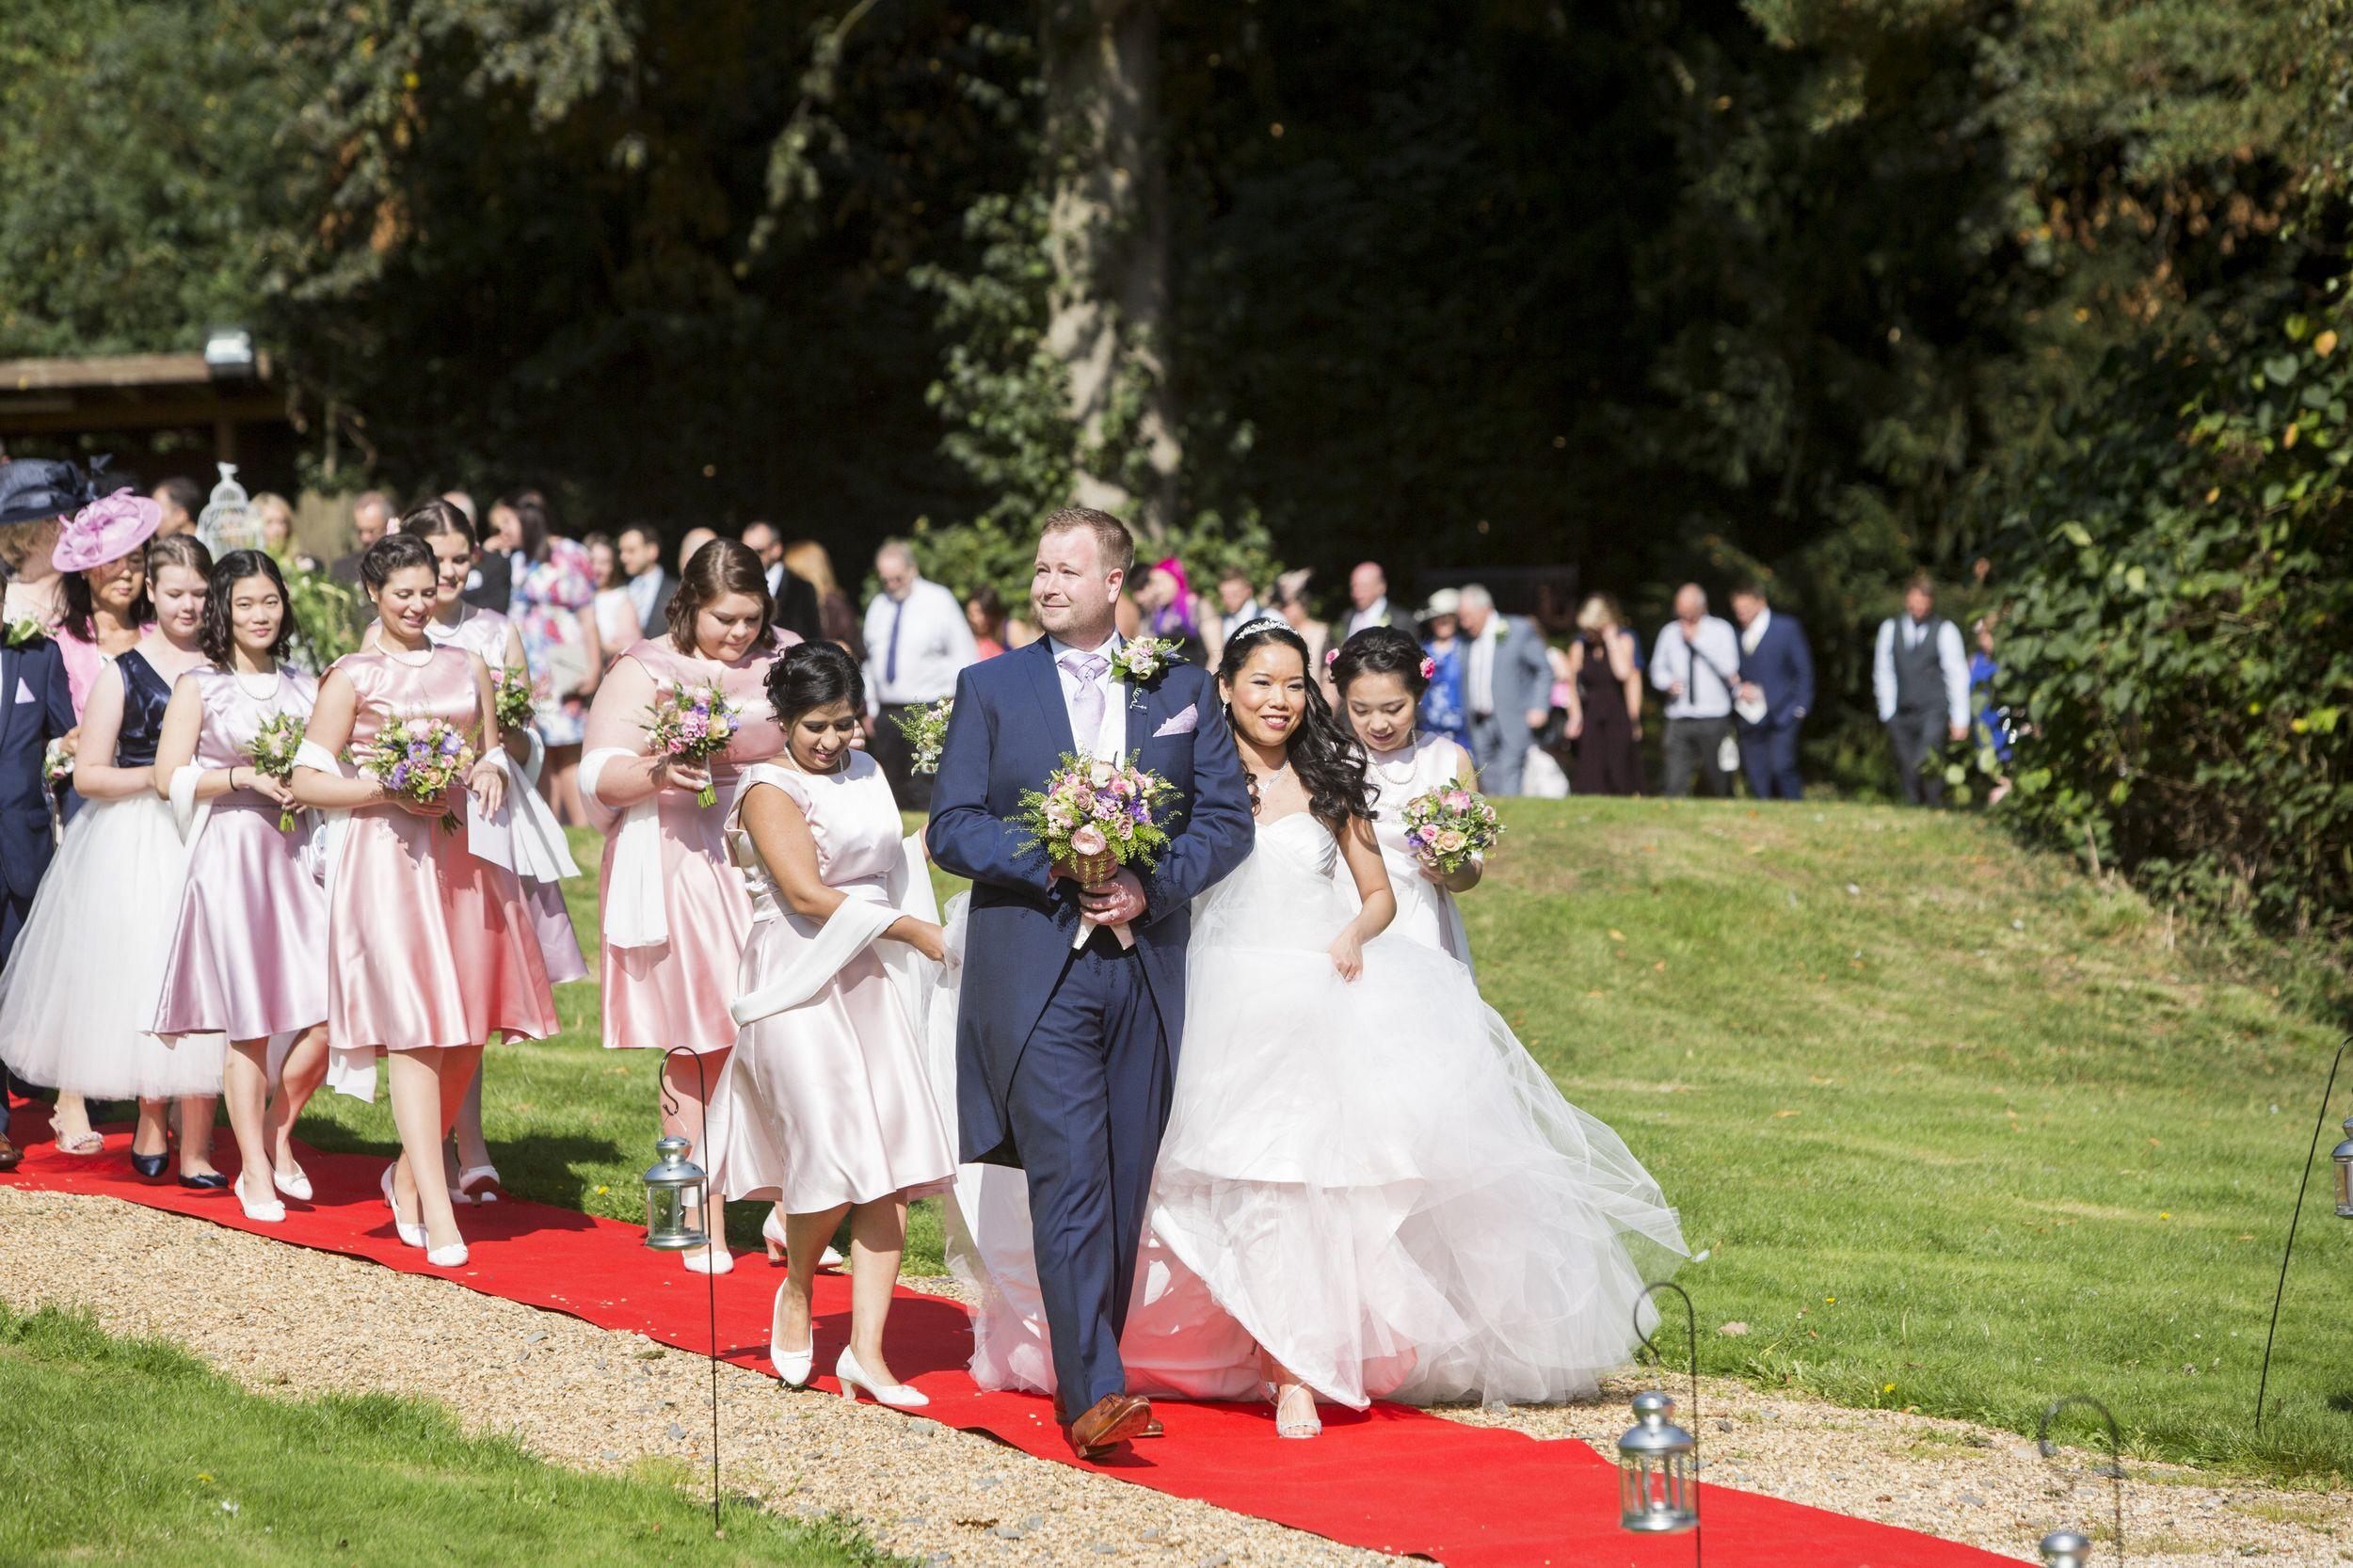 Outdoor civil ceremony venues